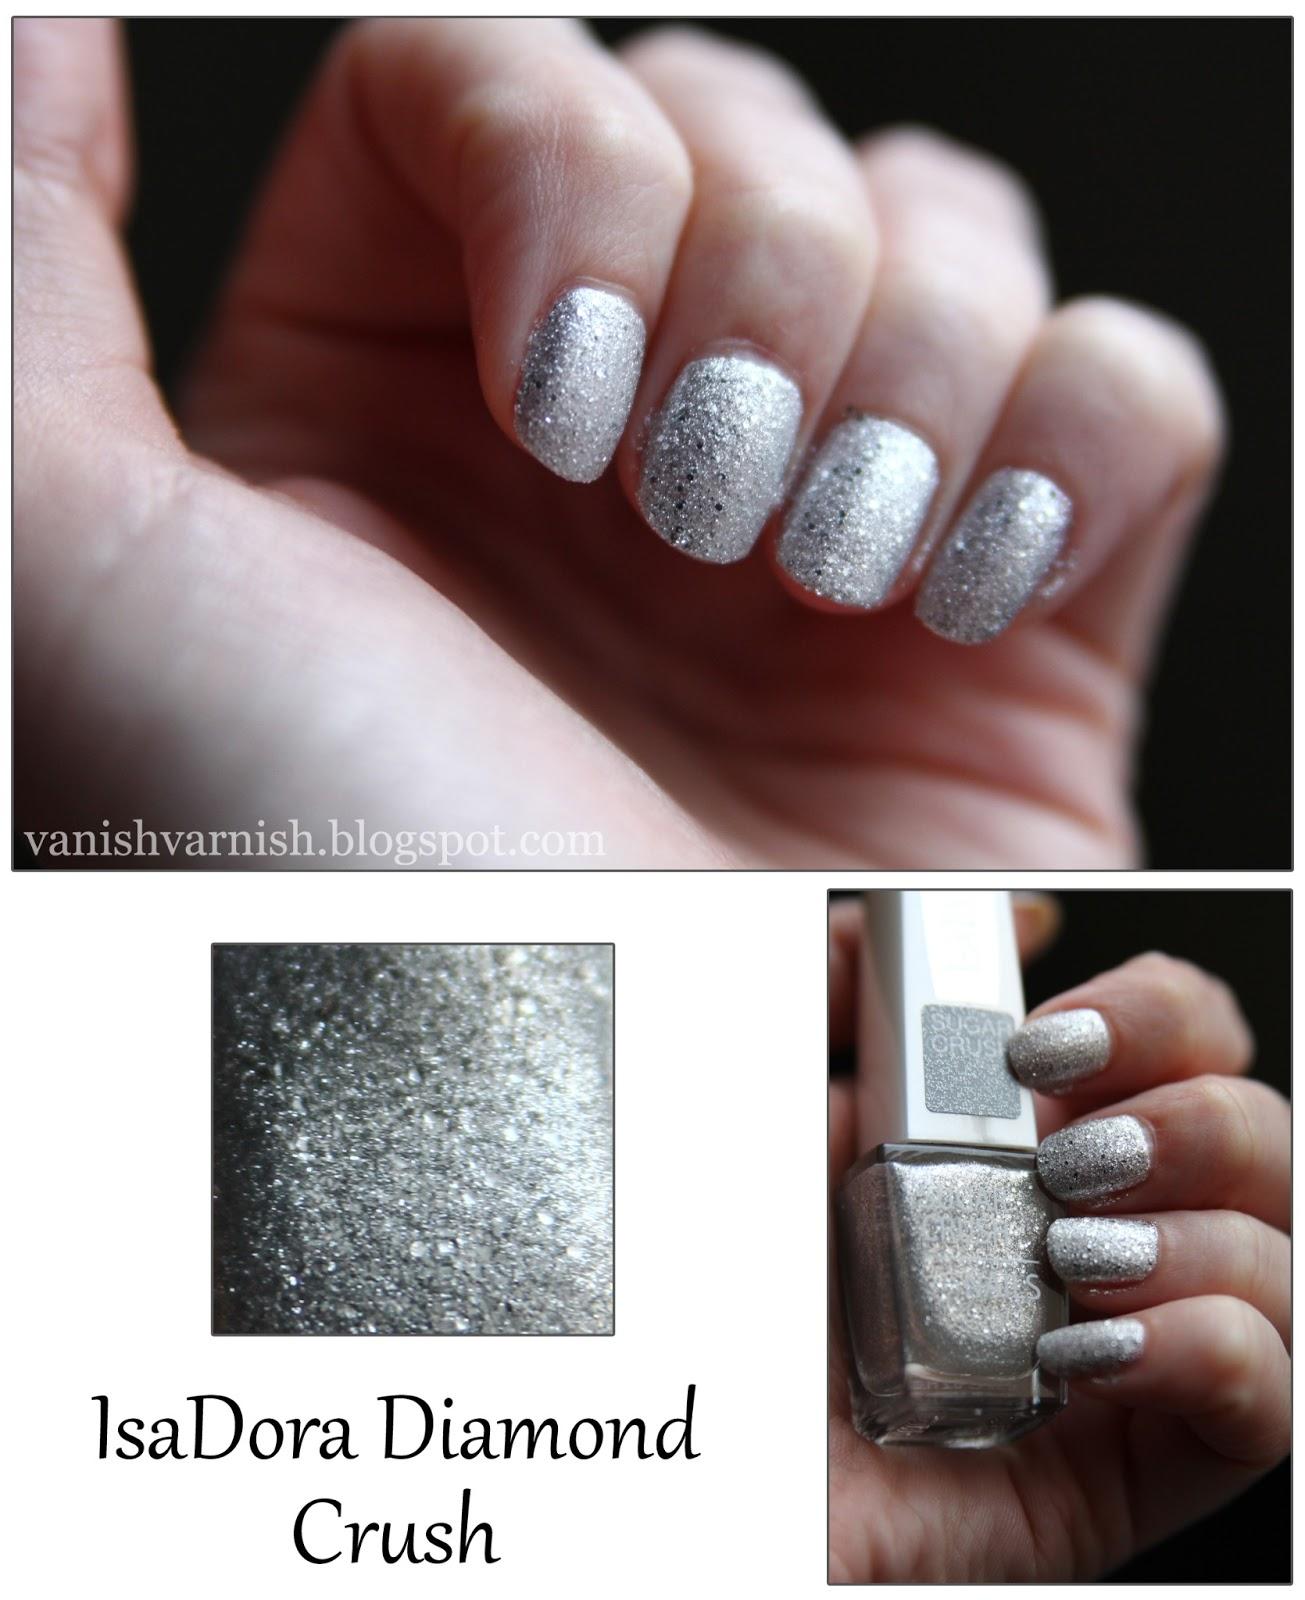 Vanish varnish? Never on this blog: IsaDora Diamond Crush